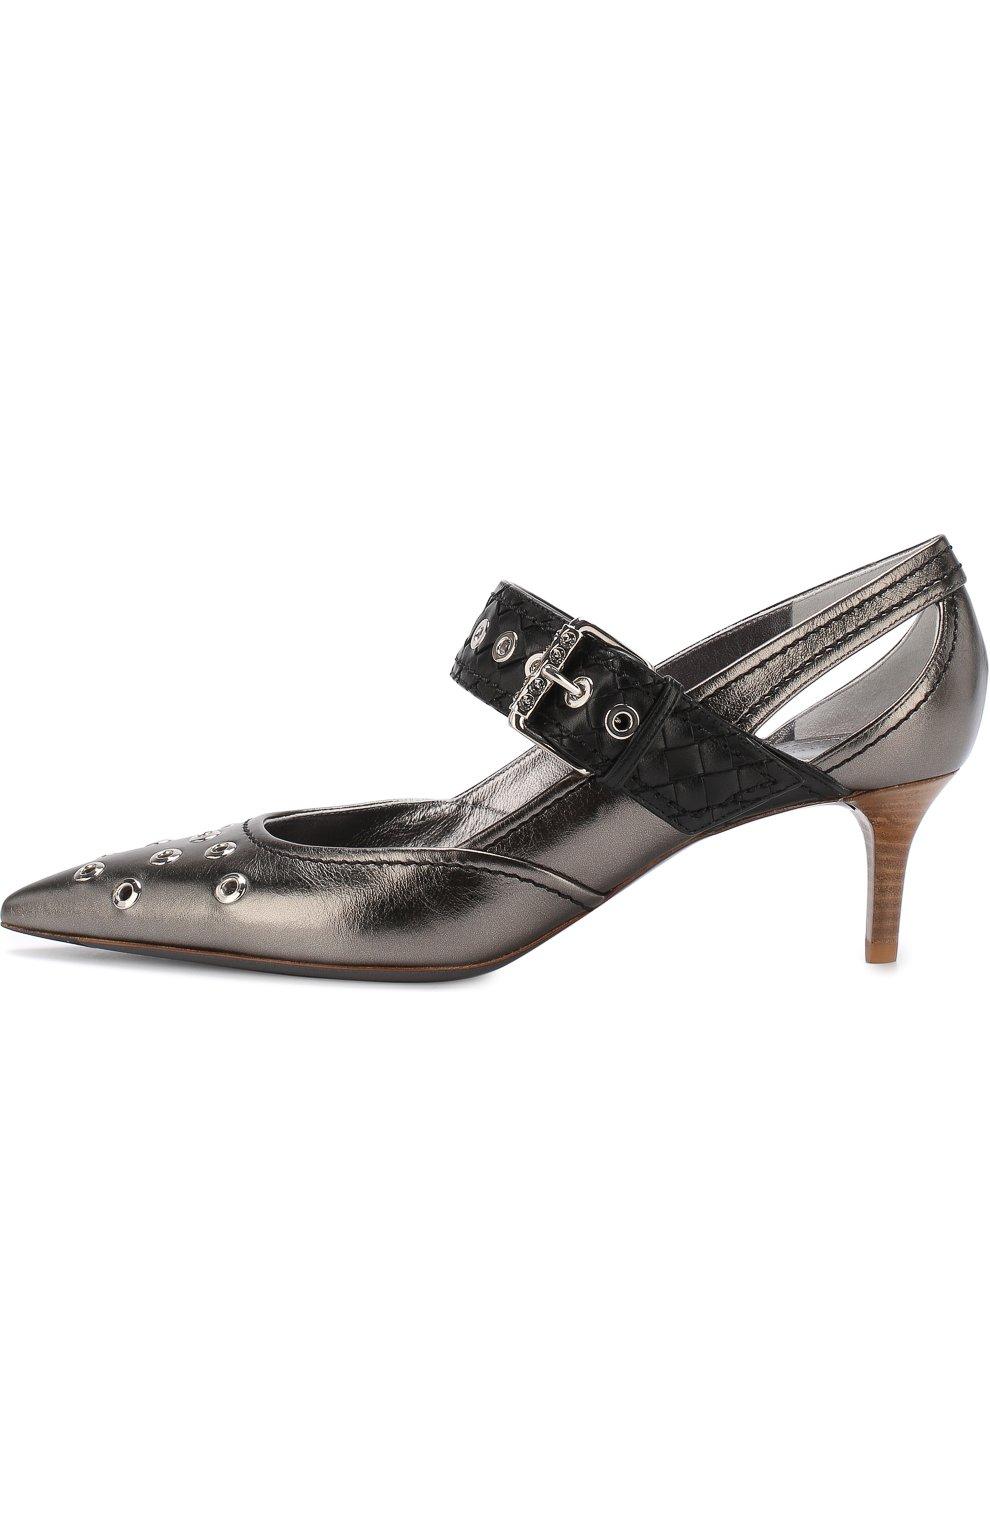 Женские туфли из металлизированной кожи на каблуке kitten heel BOTTEGA VENETA серебряного цвета, арт. 512136/VAVG6 | Фото 3